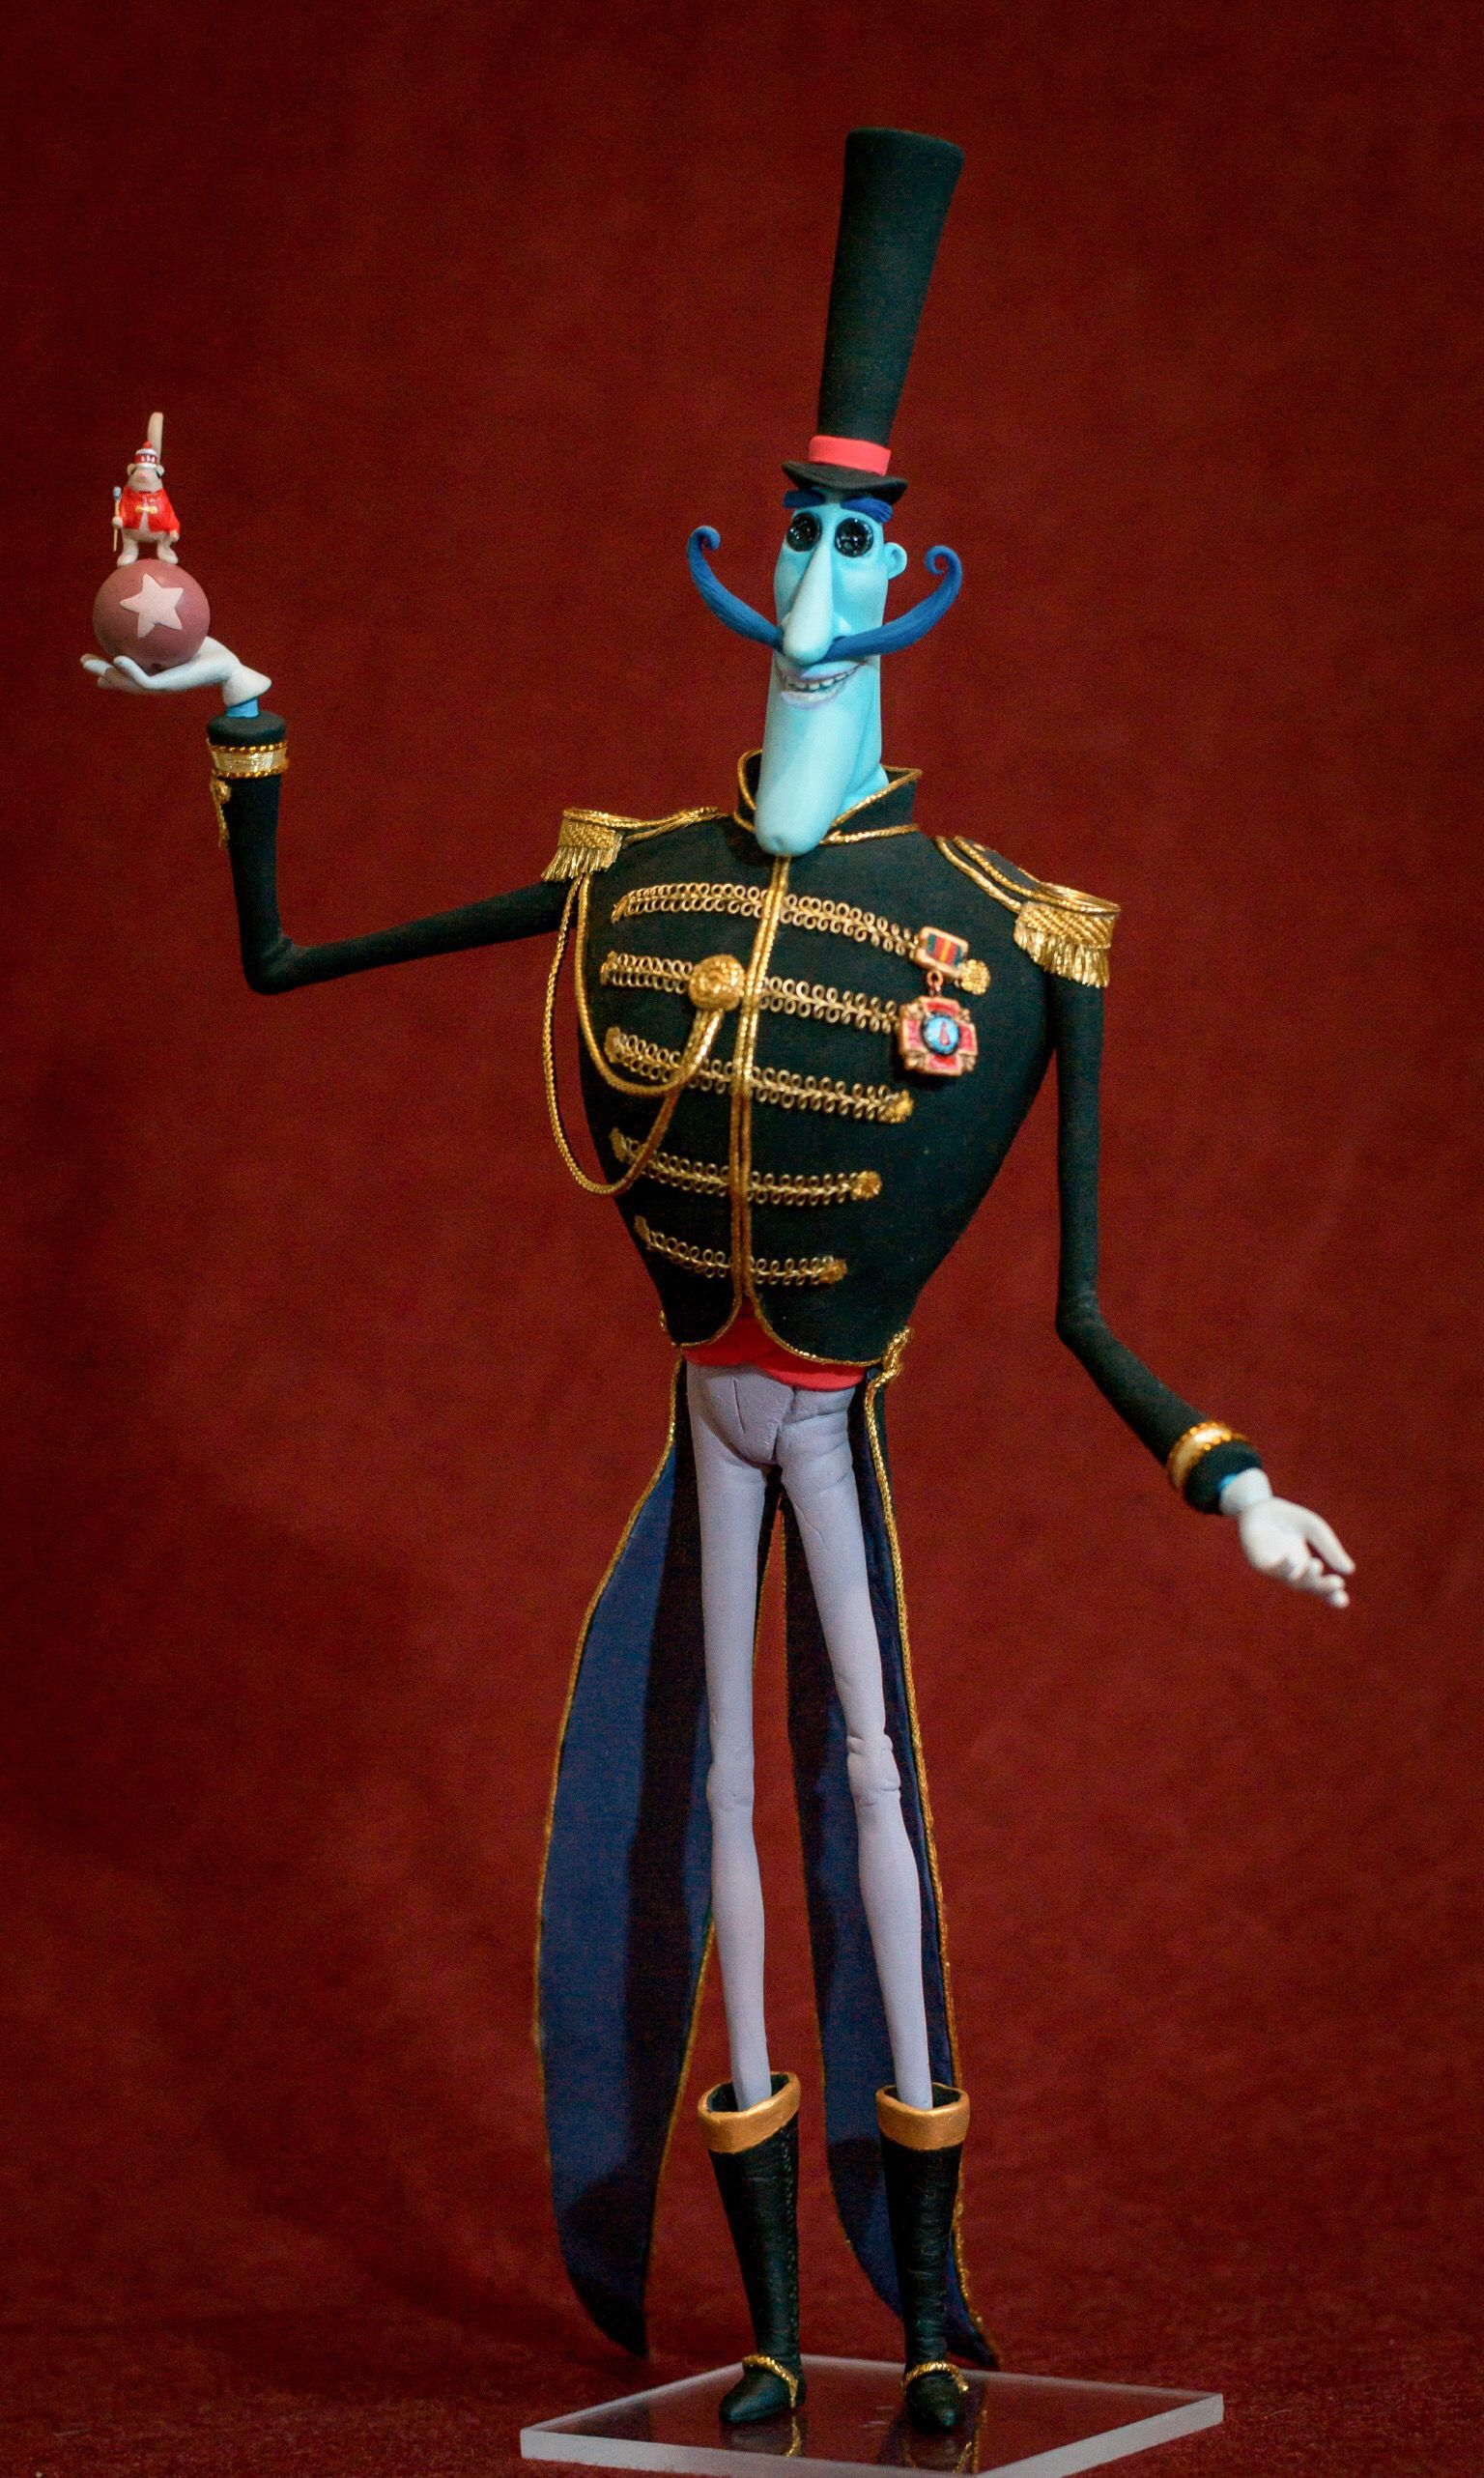 Mr Bobinsky Coraline Coraline Movie Coraline Coraline Characters